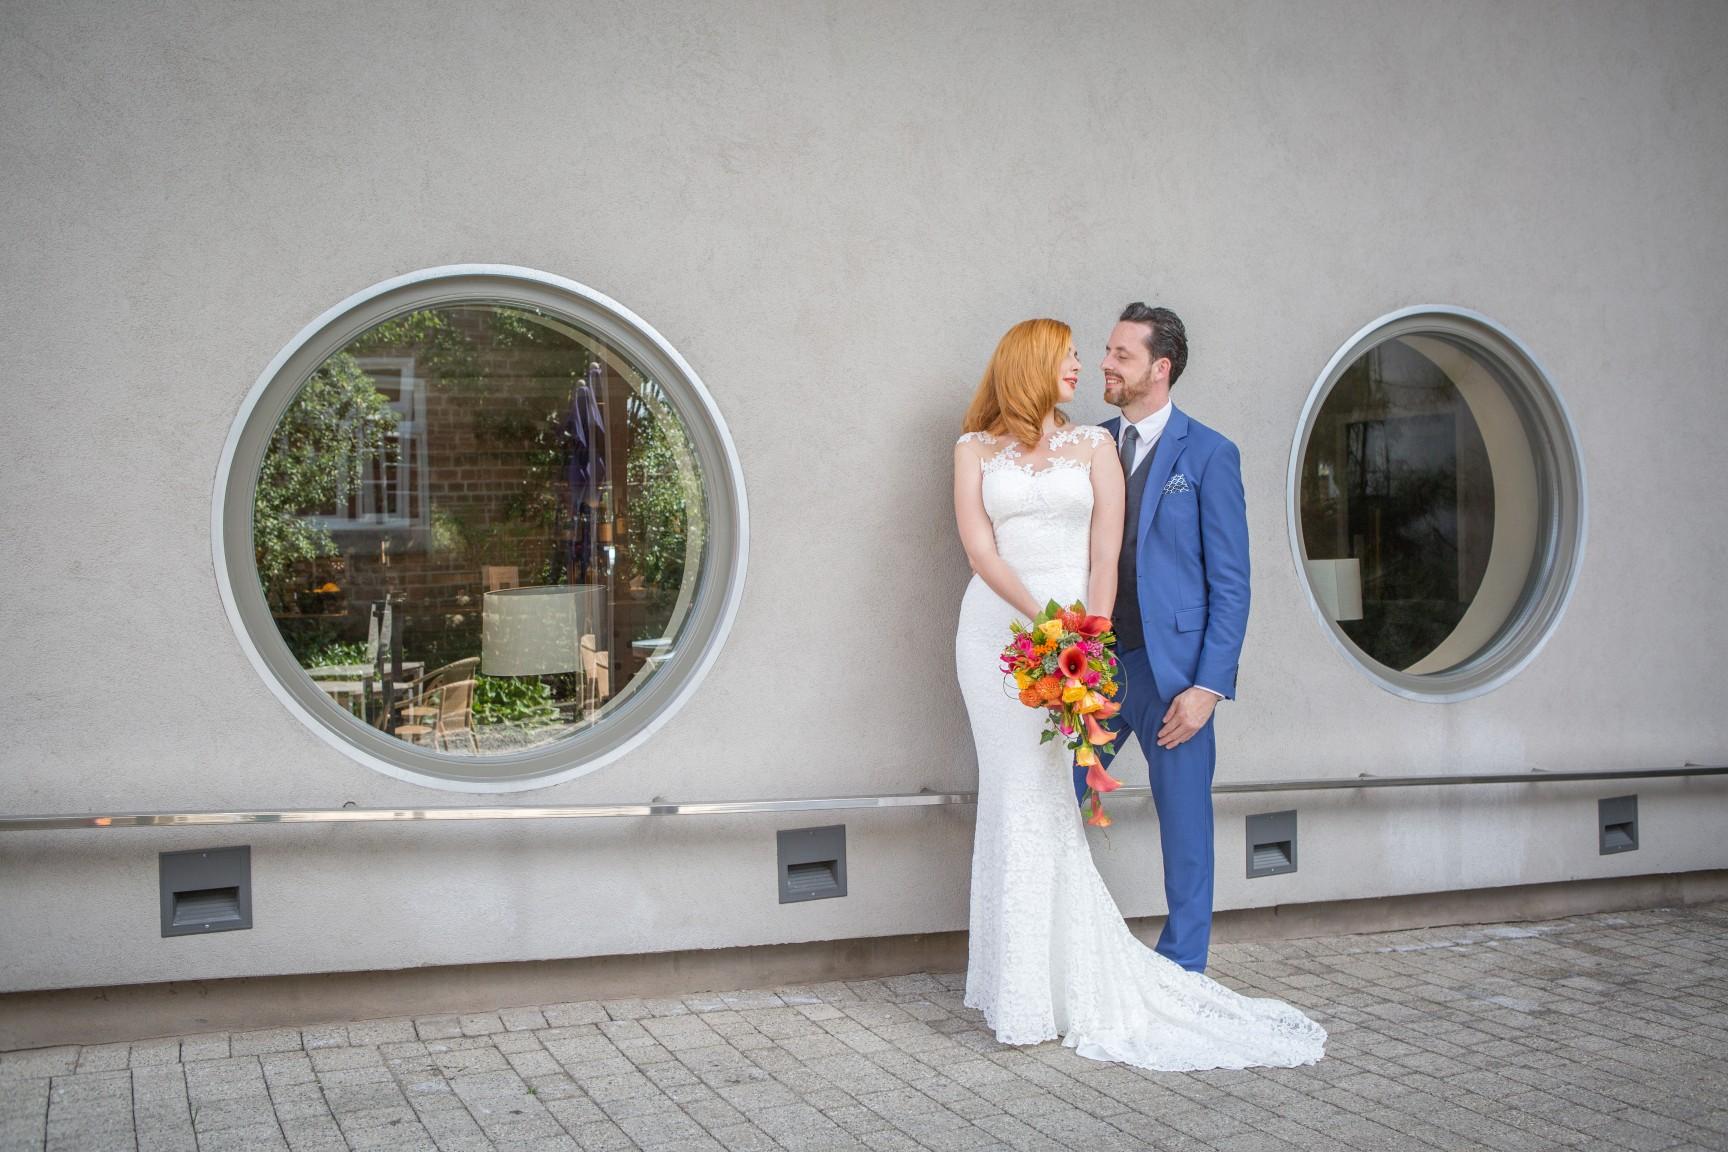 harts nottingham wedding day - colourful wedding - colourful bride - alternative wedding day